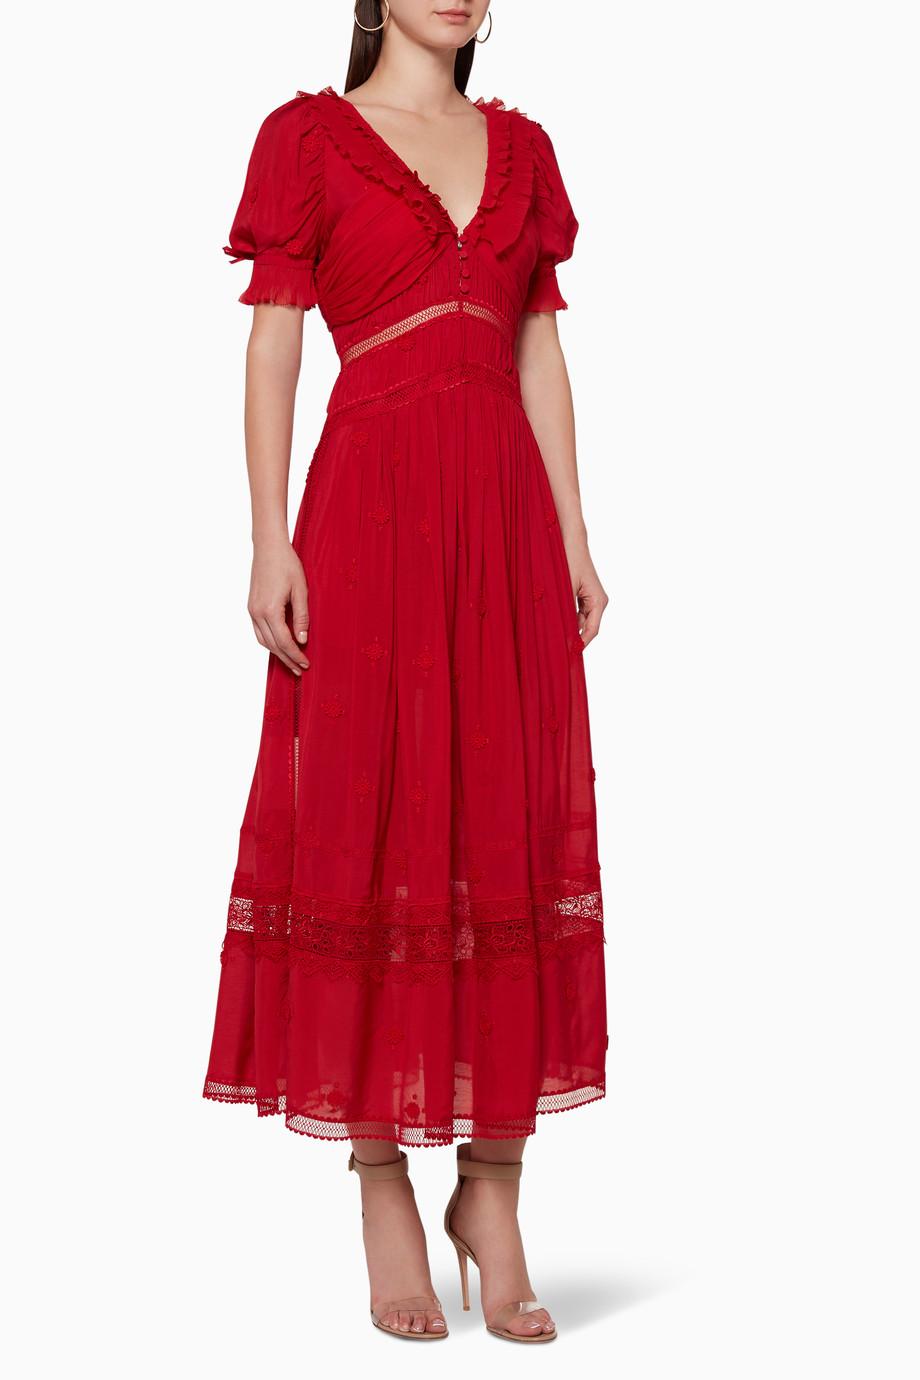 29b219956790 Shop Self-Portrait Red 3D Plumetis Midi Dress for Women | Ounass ...